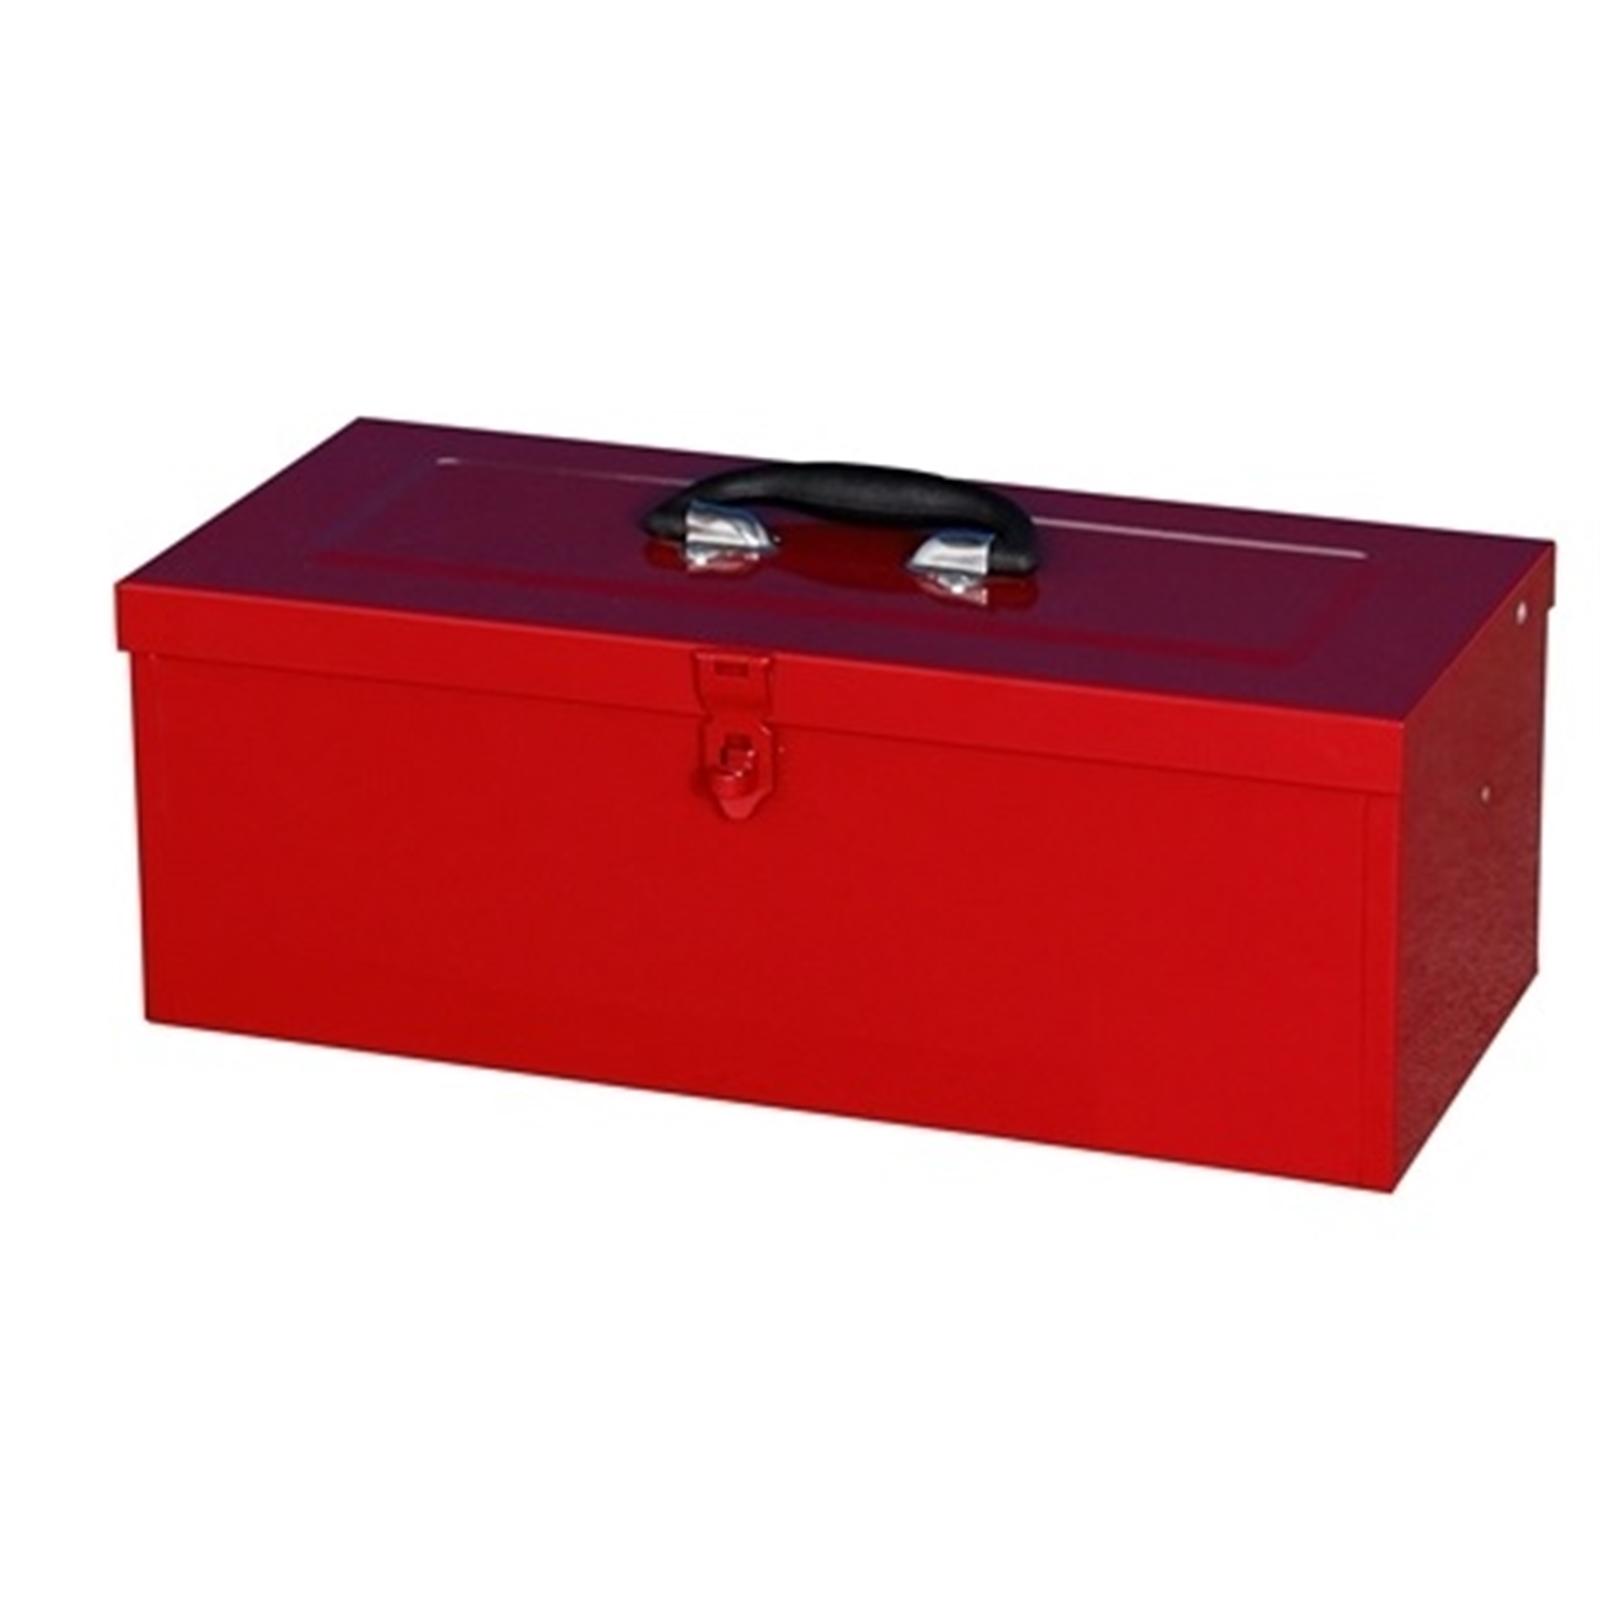 Craftright Tool Box Metal  460mm Red